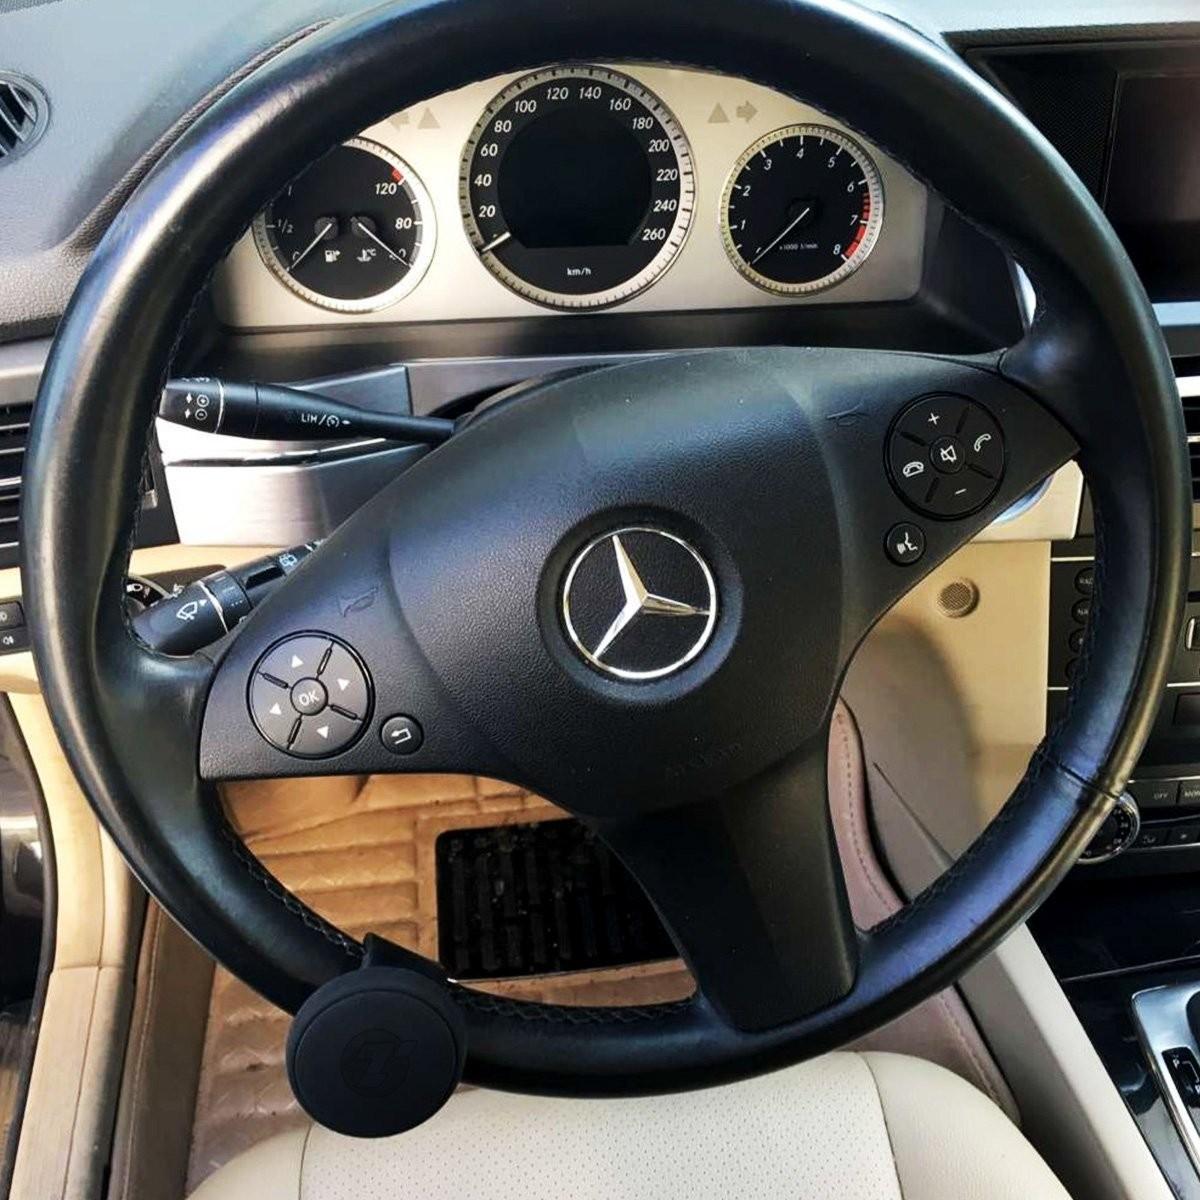 Auto Accessories | Headlight bulbs | Car Gifts Car ...